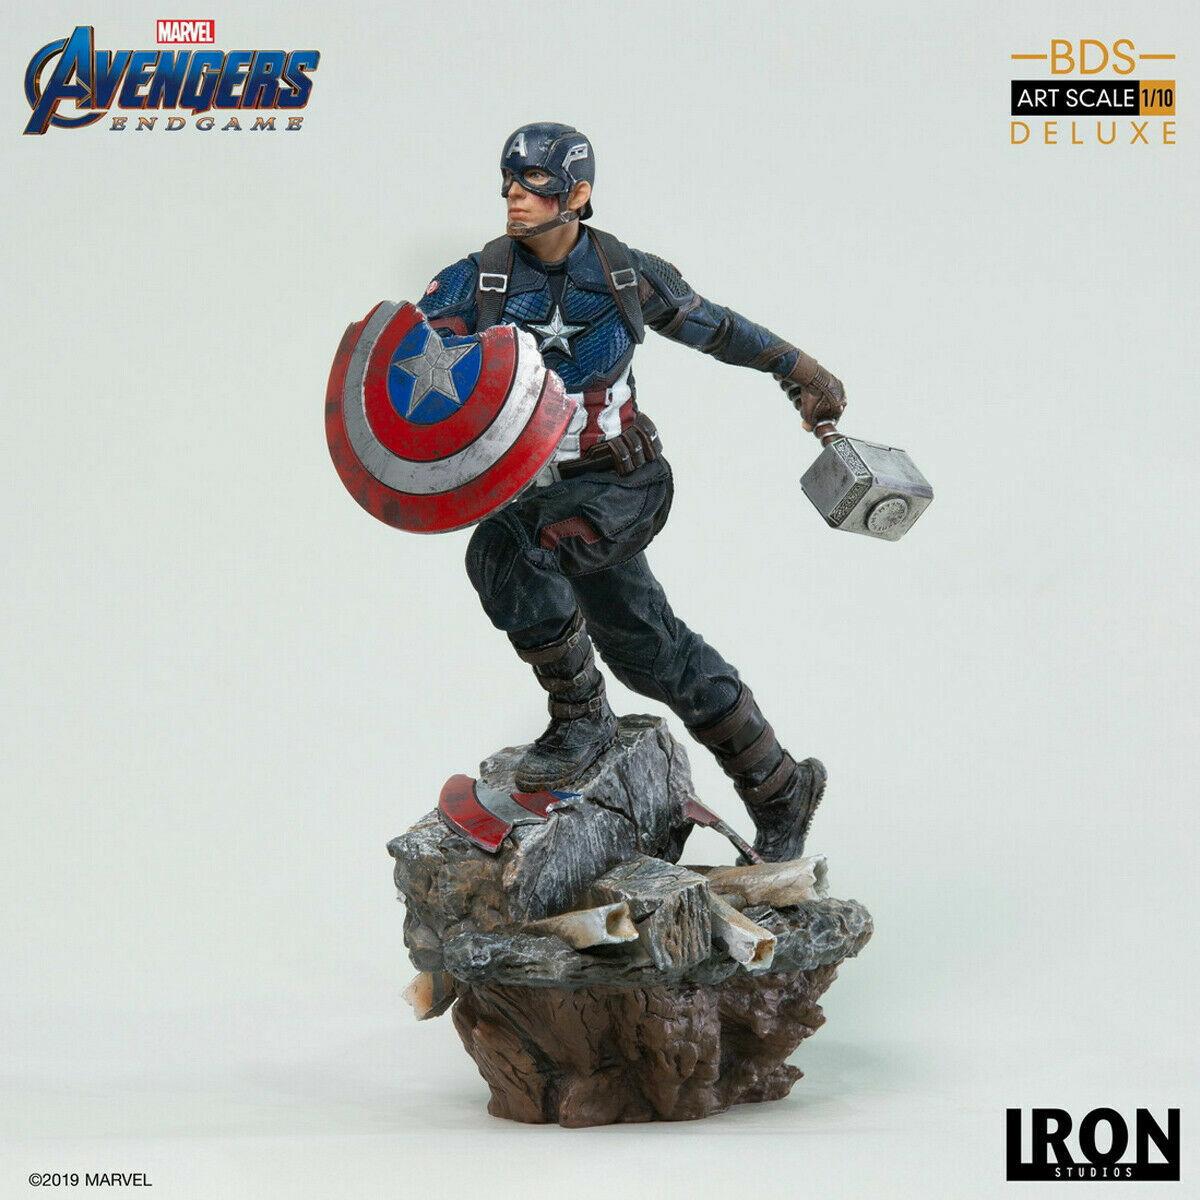 Iron Studios Captain America Deluxe BDS Art Scale 1/10 Avengers: Endgame Statue on eBay thumbnail